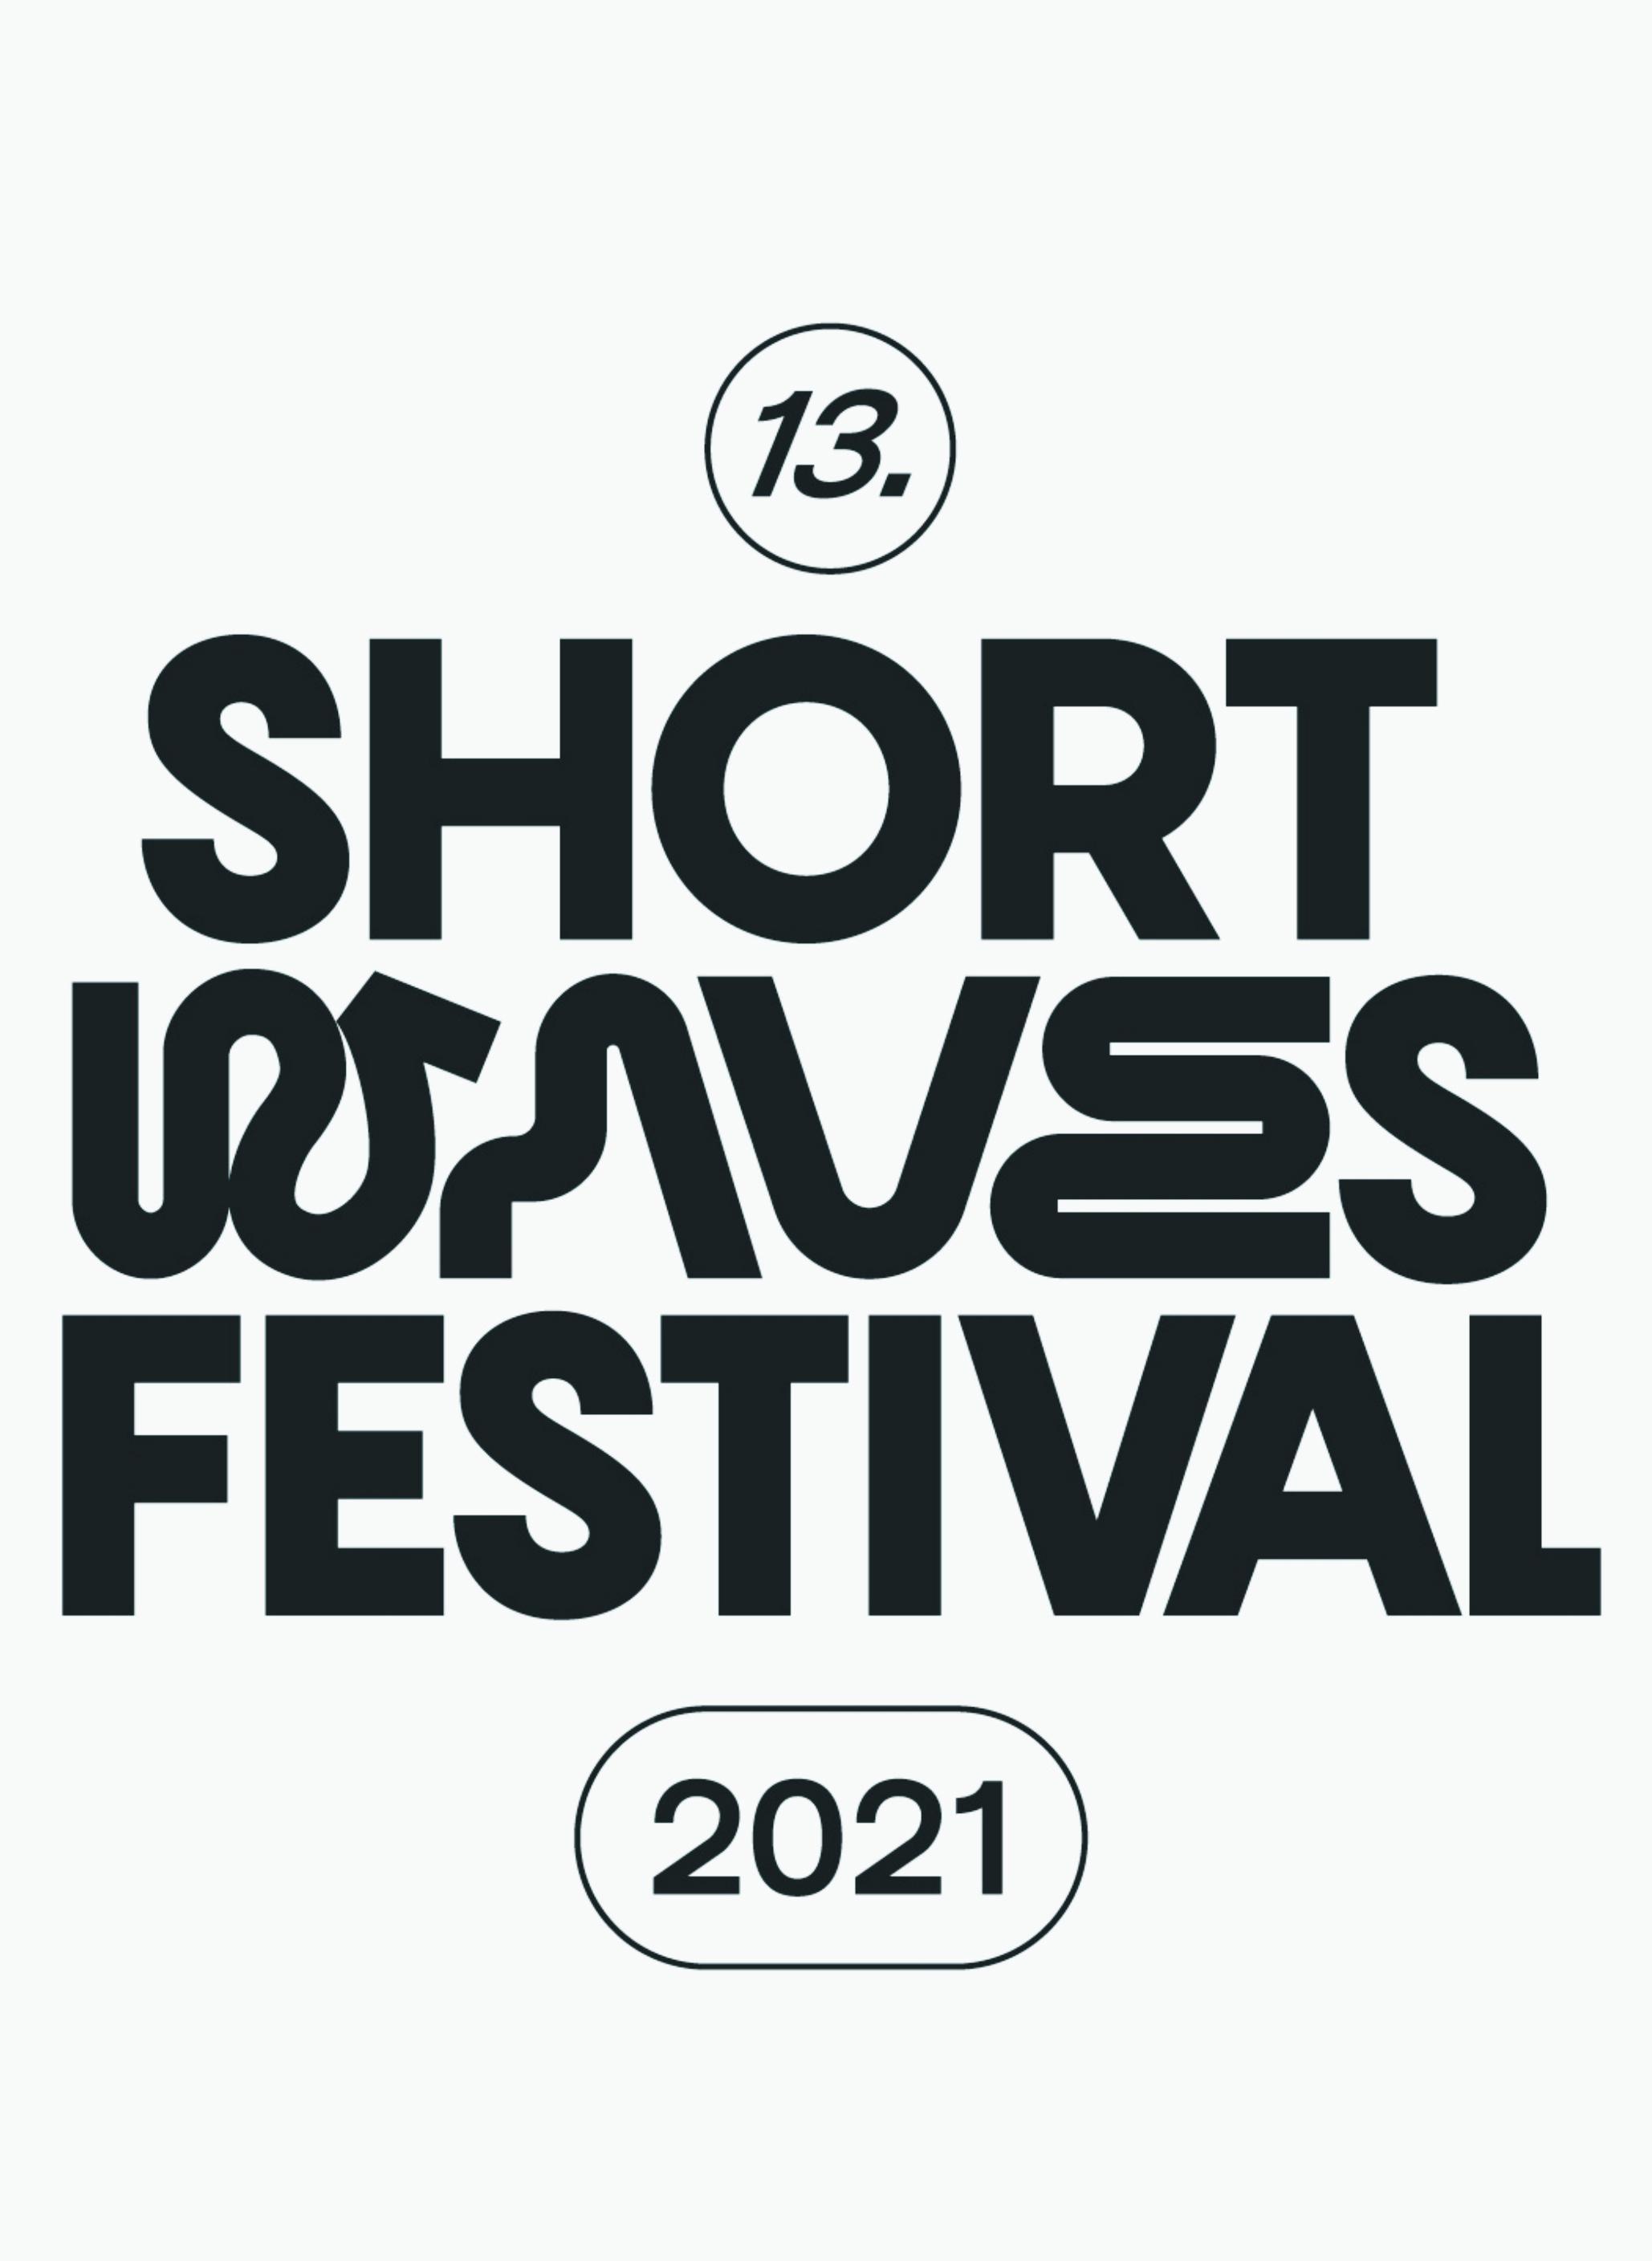 Short Waves Festival 2021 - Polish Competition I